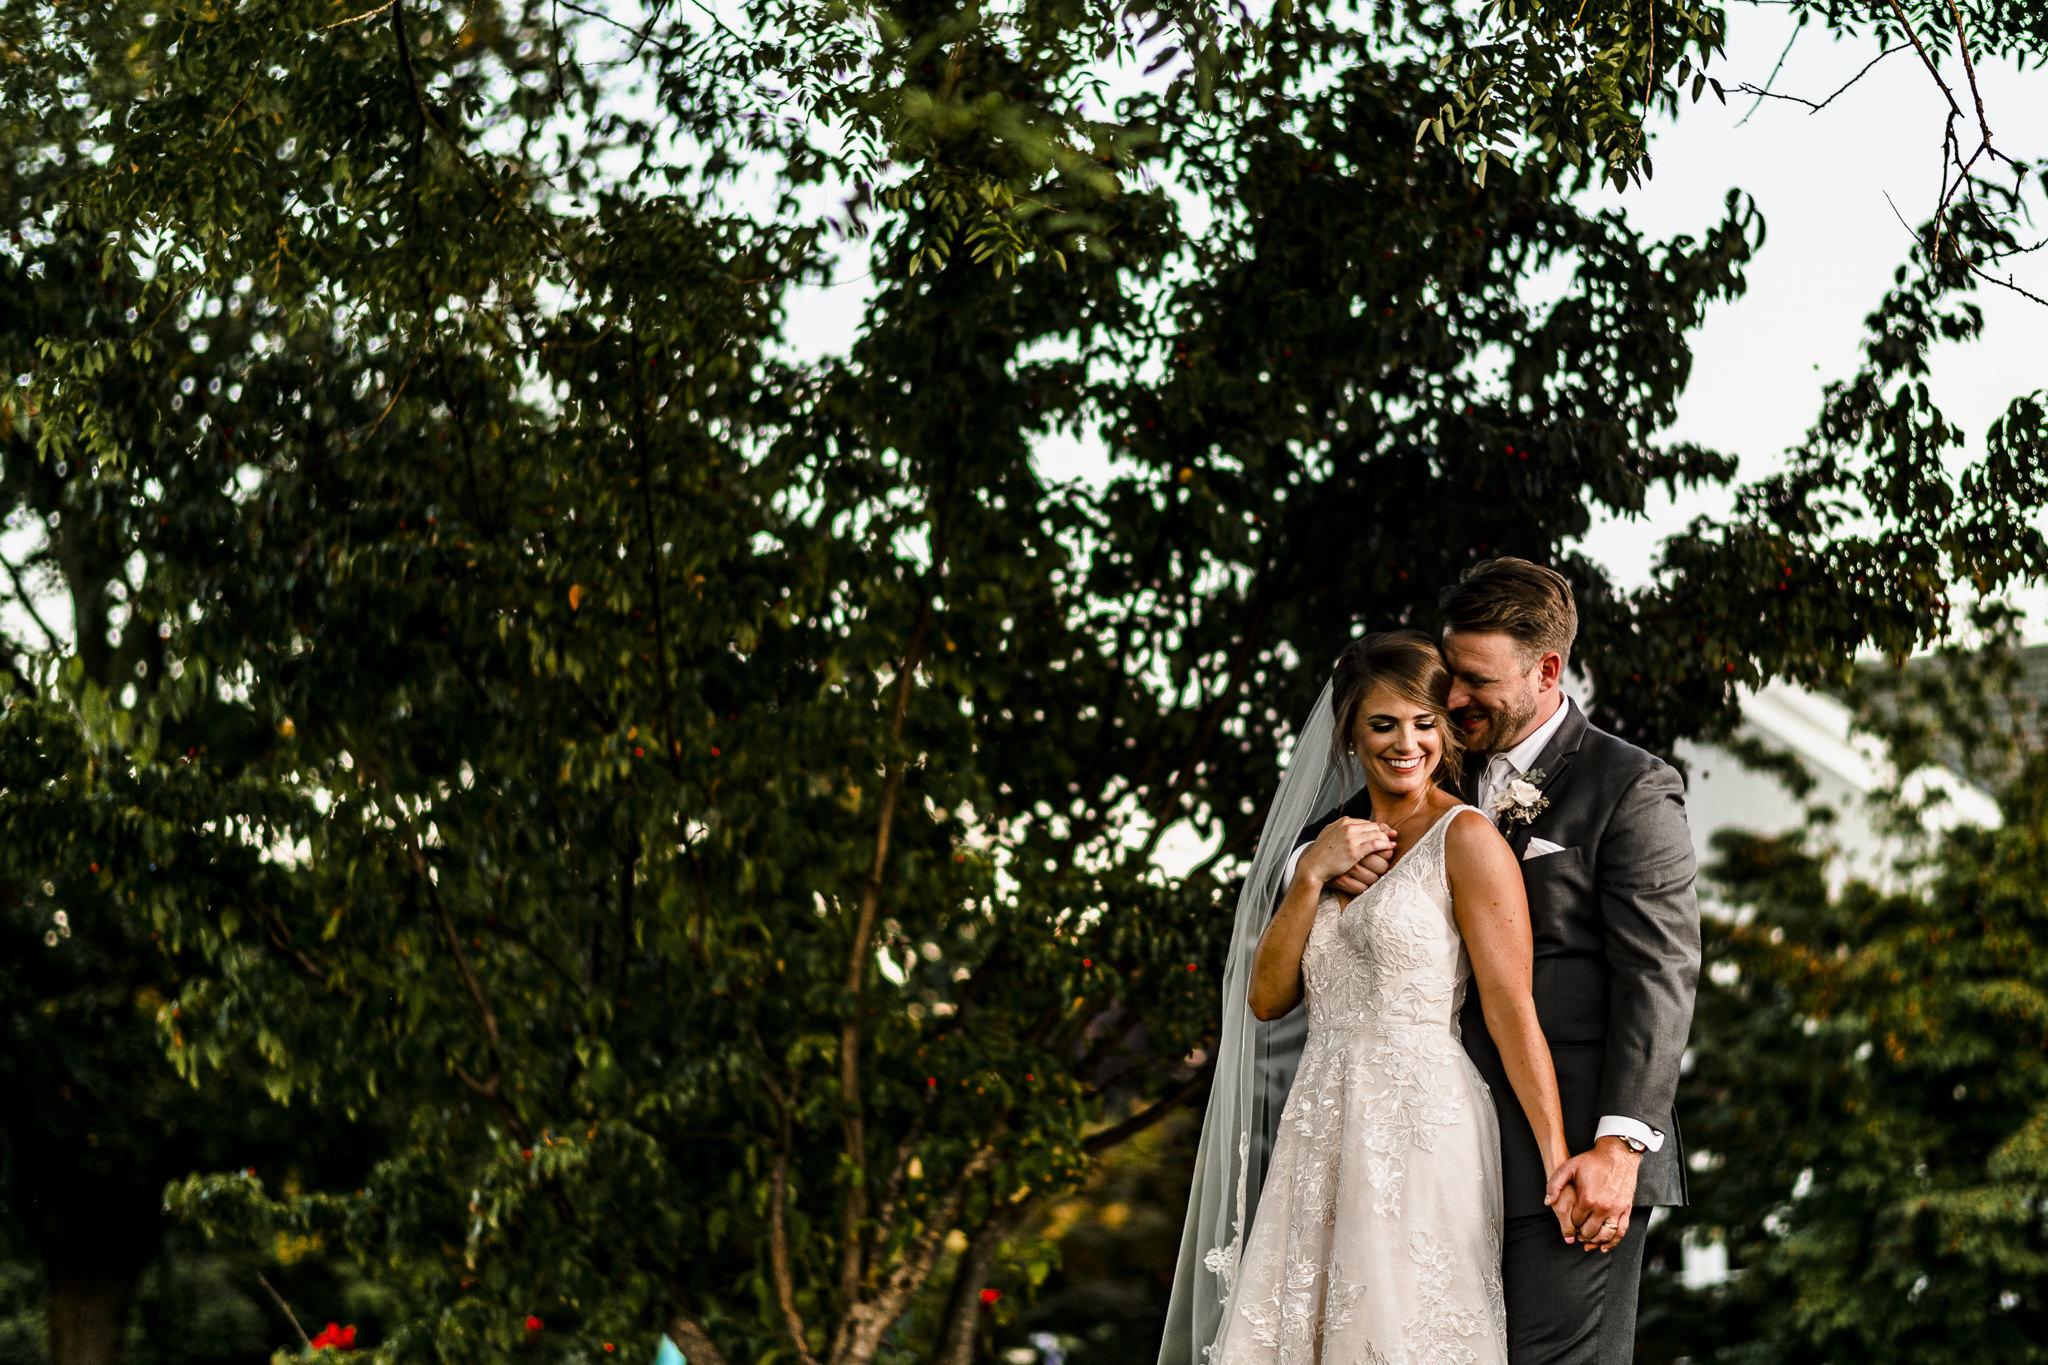 Coyle-Forsgate-Country-Club-Wedding-Photographer-32.JPG